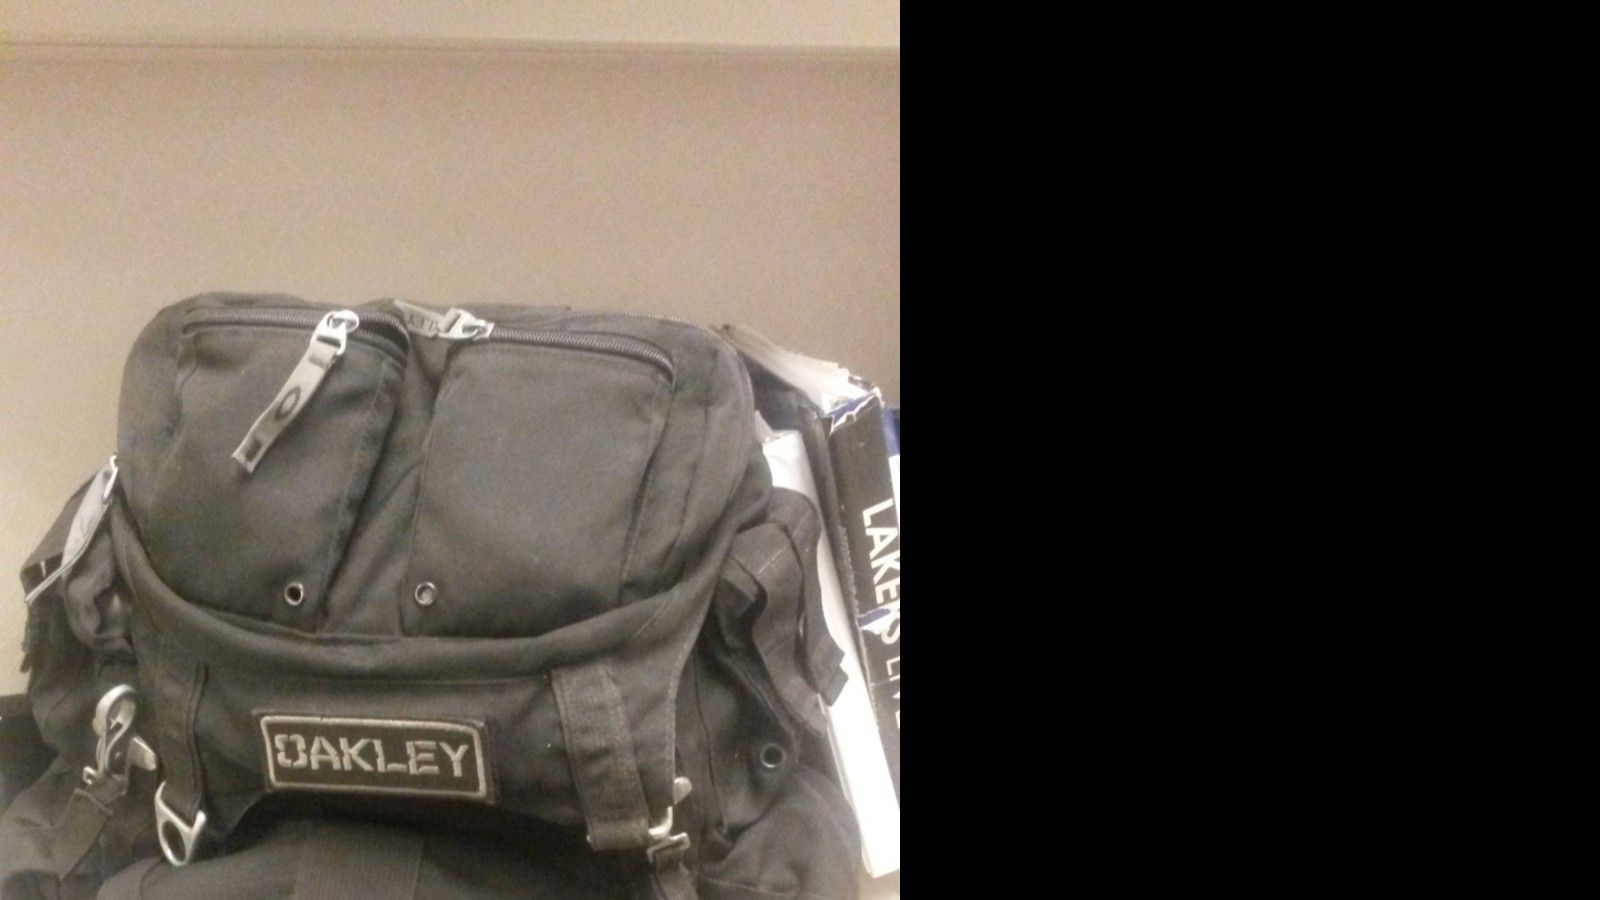 Used Oakley Backpack Mechanism Pack (backpack) - mt47qe.jpg